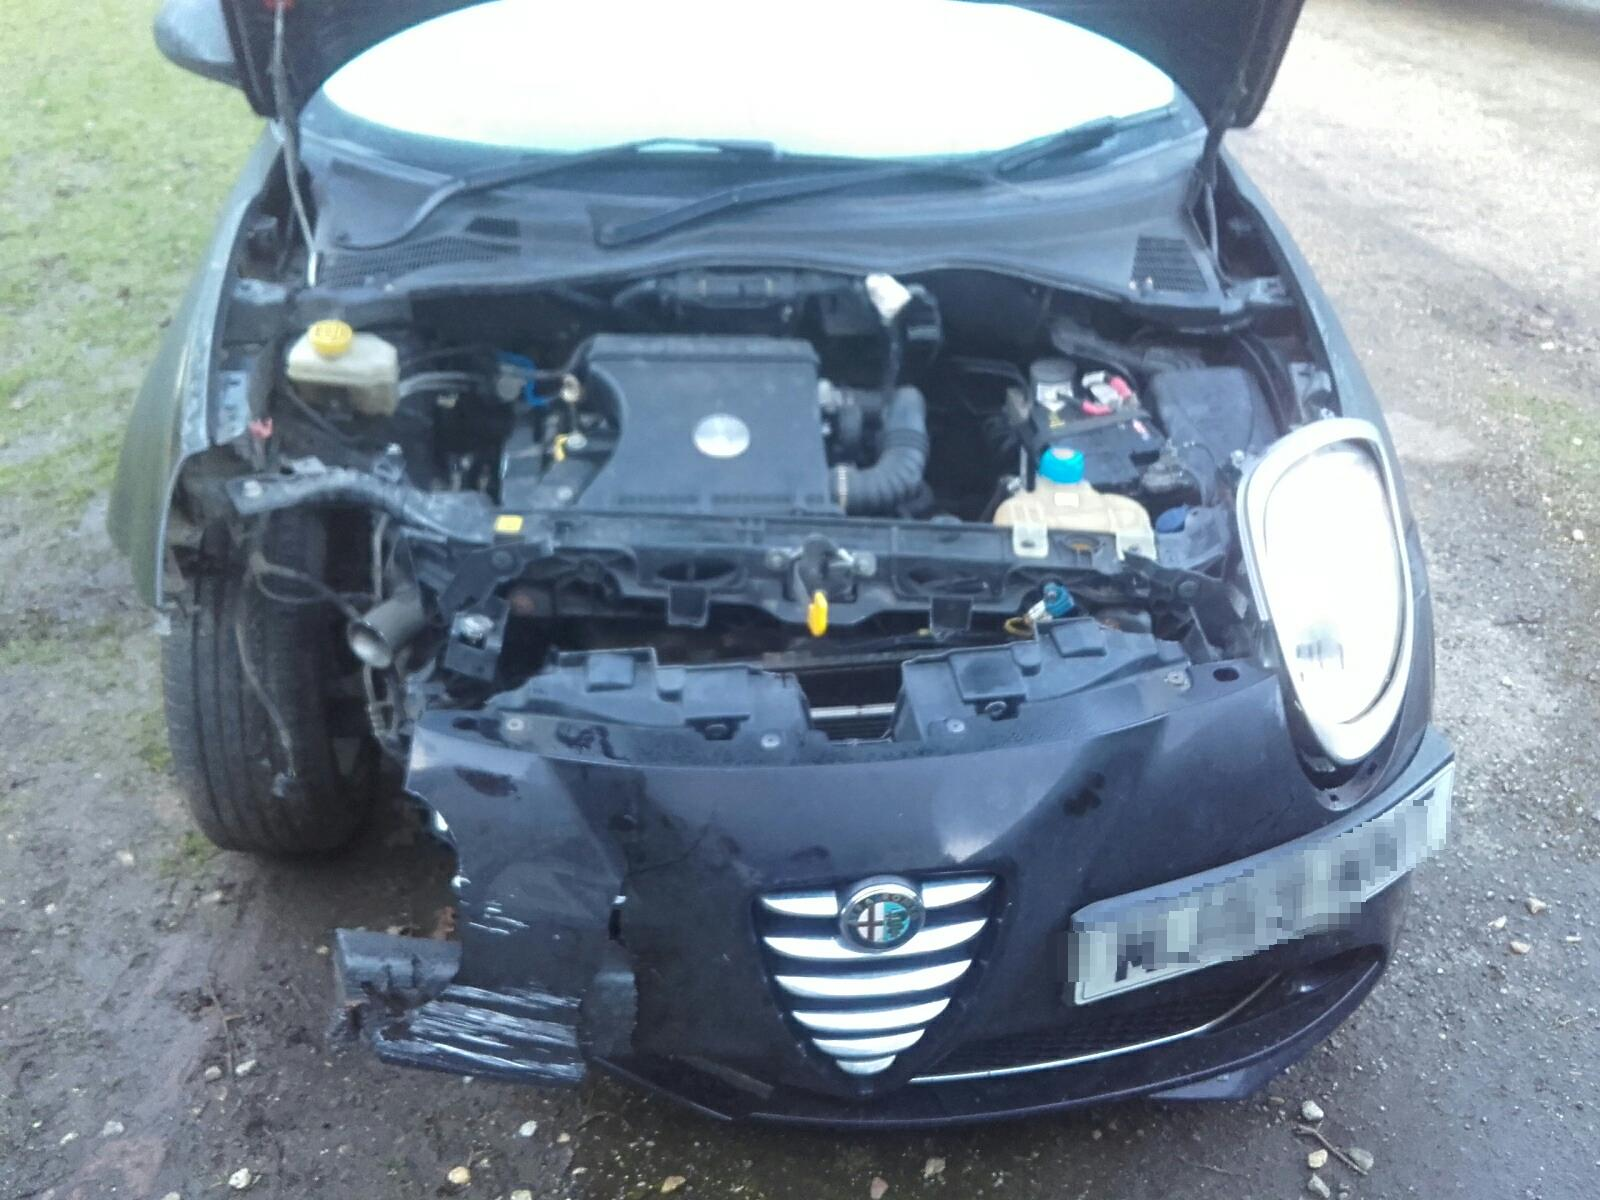 2009 Hino Fuse Box Auto Electrical Wiring Diagram Lexus Is 300 Location Alfa Romeo Mito Integra